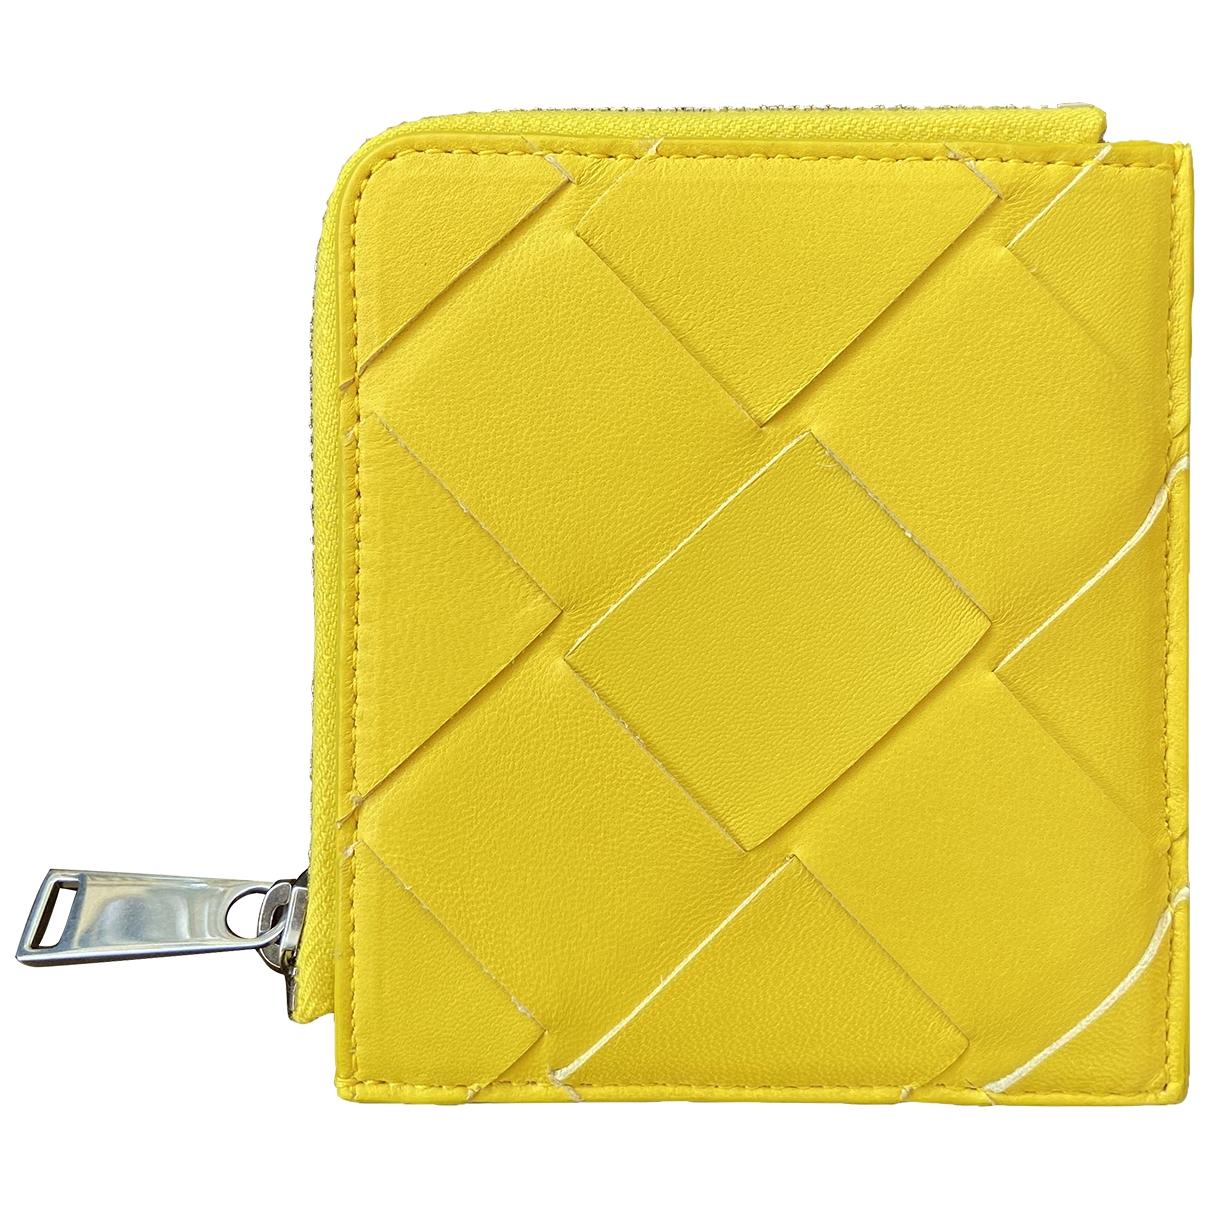 Bottega Veneta \N Yellow Leather Small bag, wallet & cases for Men \N